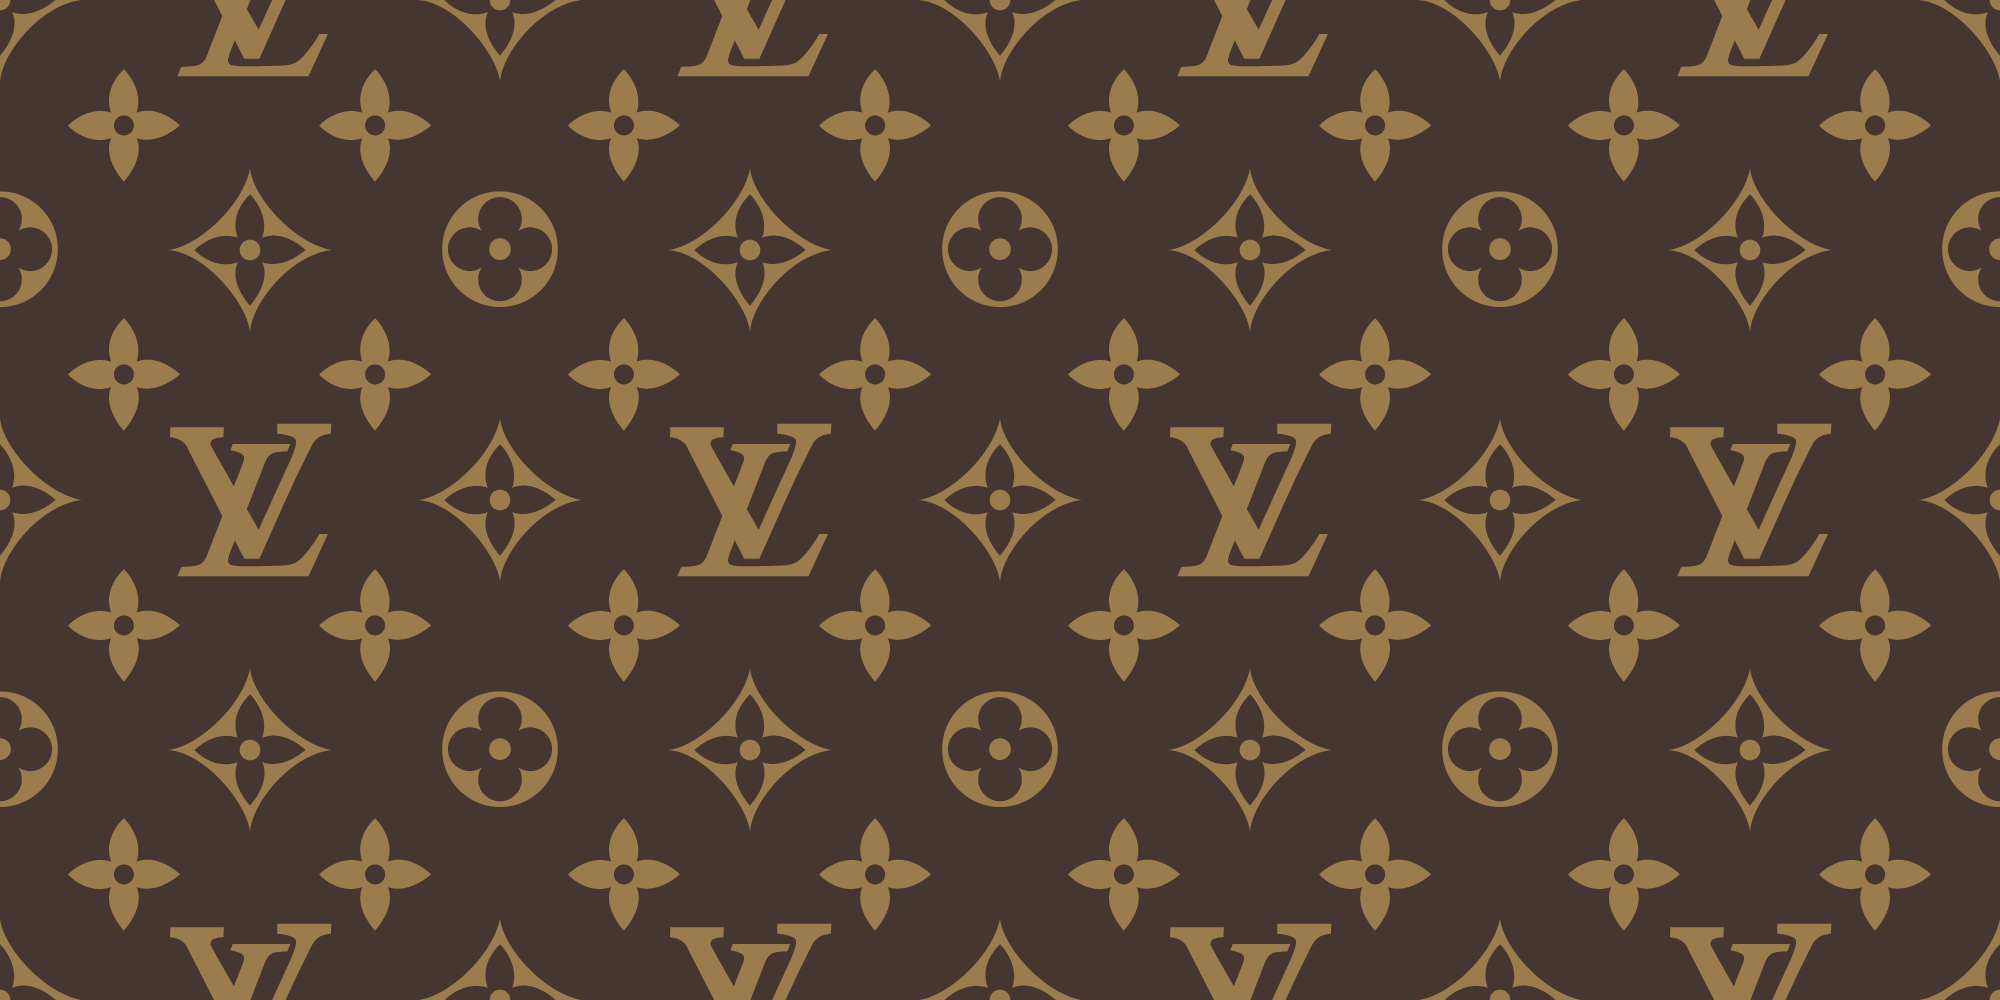 Buy Louis Vuitton Car Seat Covers